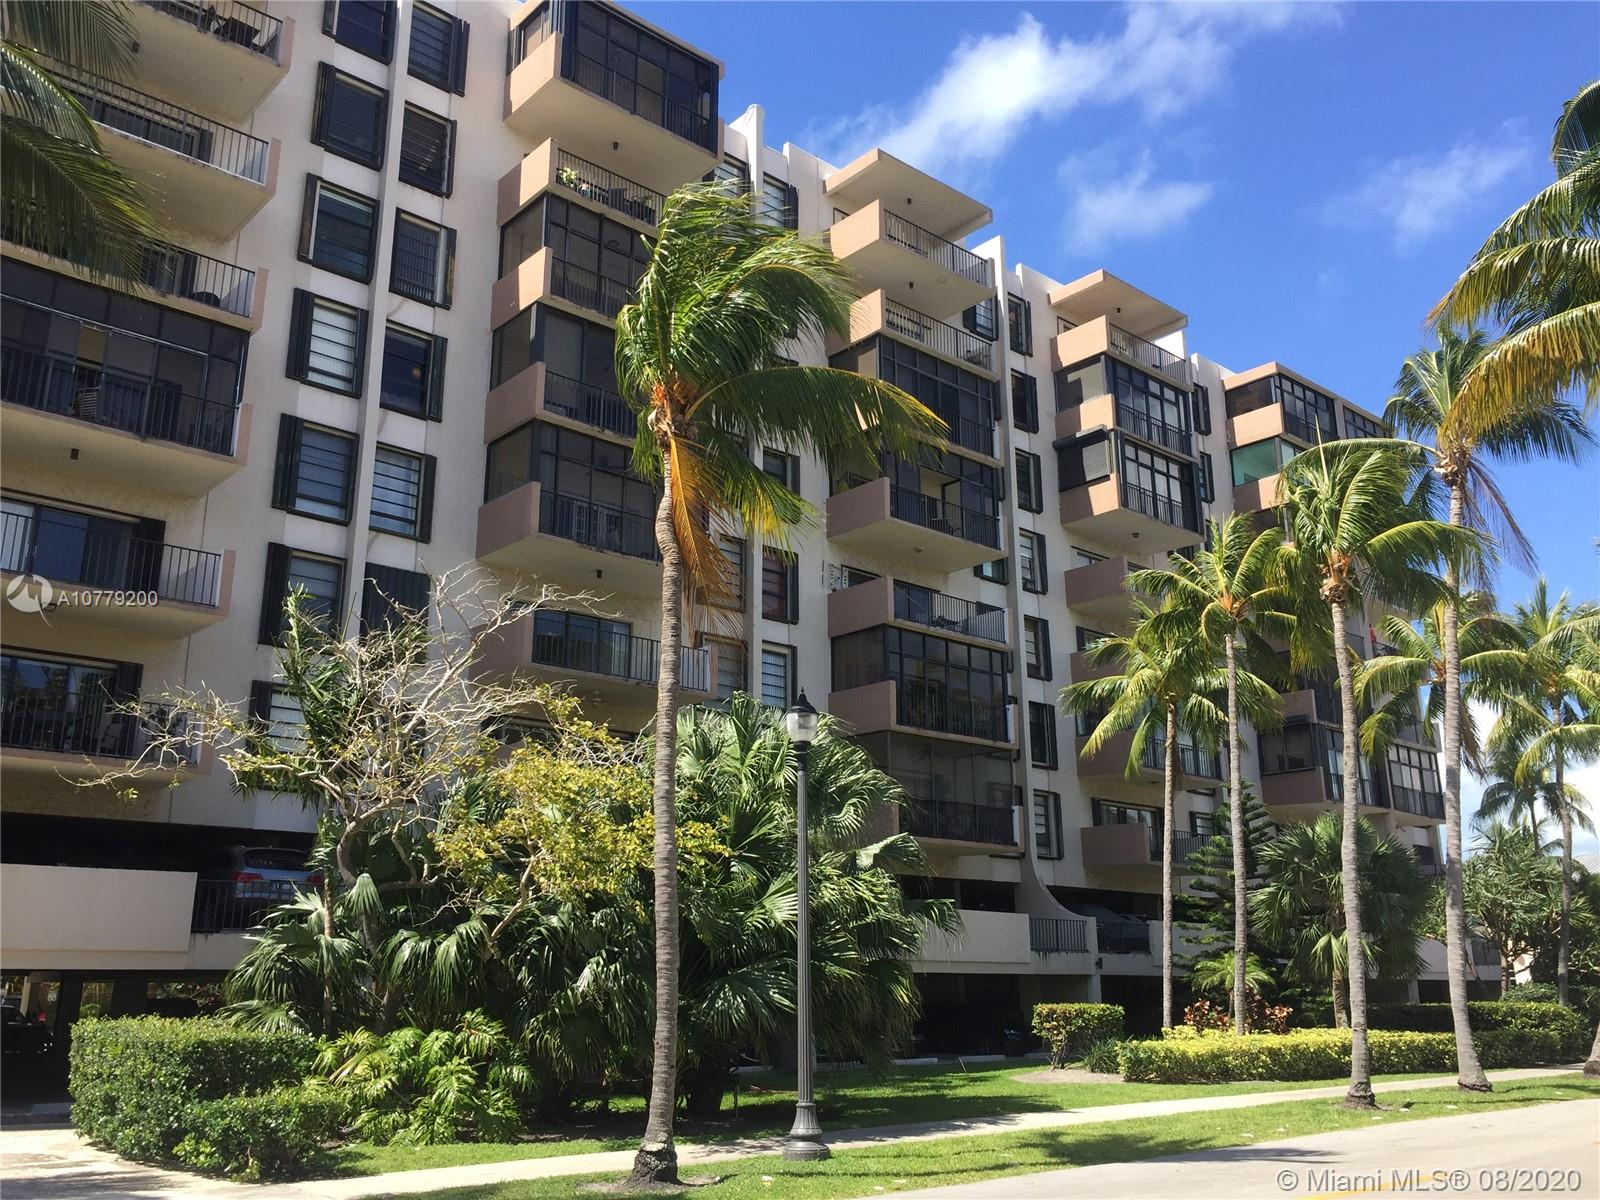 575 Crandon Blvd # 808, Key Biscayne, Florida 33149, 2 Bedrooms Bedrooms, ,2 BathroomsBathrooms,Residential,For Sale,575 Crandon Blvd # 808,A10779200